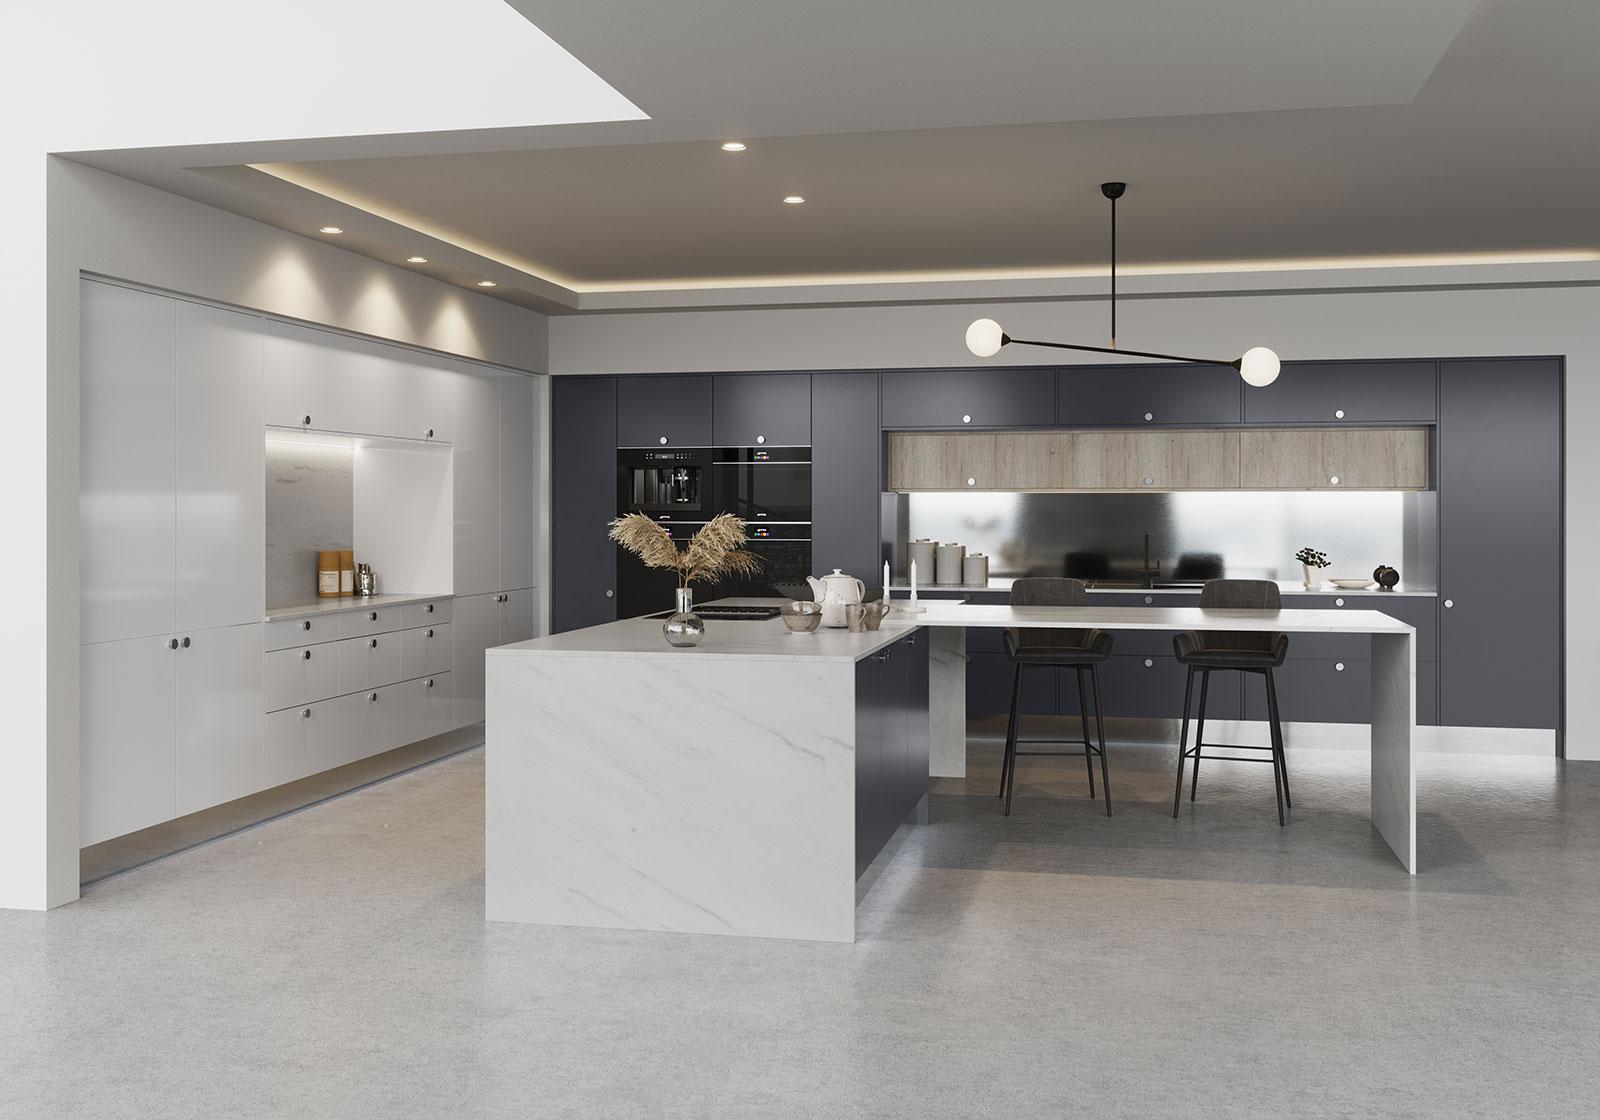 Modern Kitchens  Ideas & Inspiration  Masterclass Kitchens®